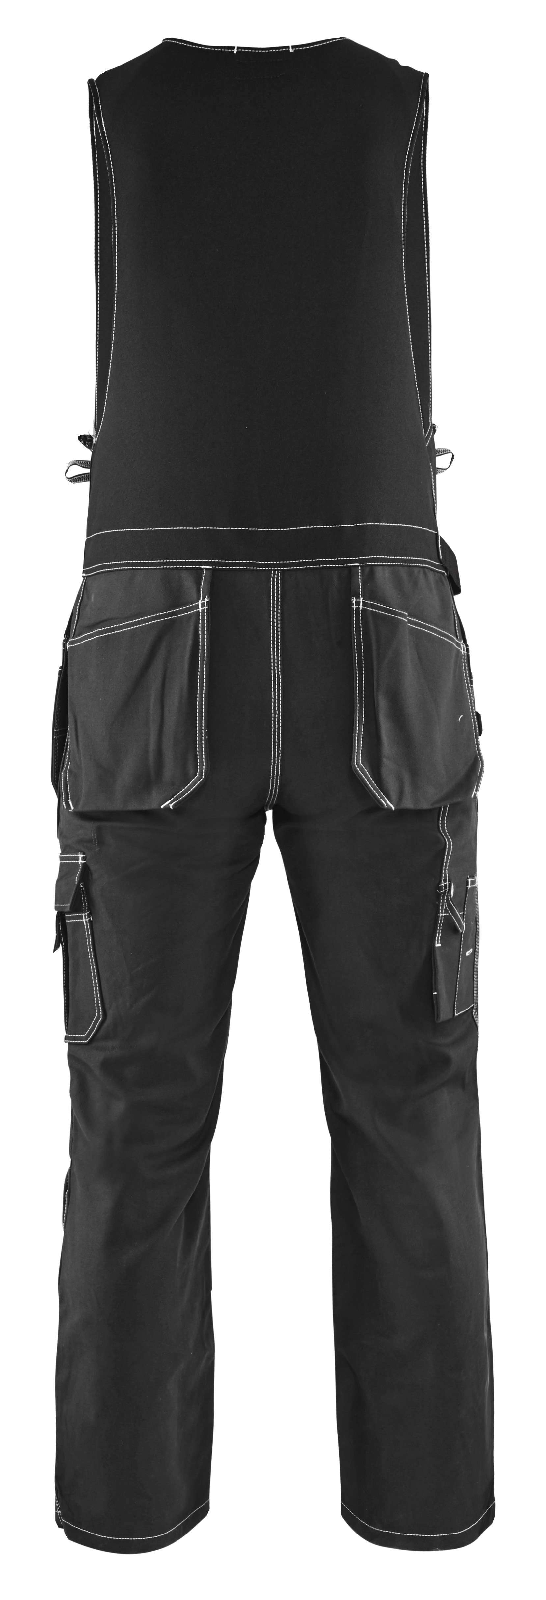 Blaklader Bodybroeken 26501370 zwart(9900)